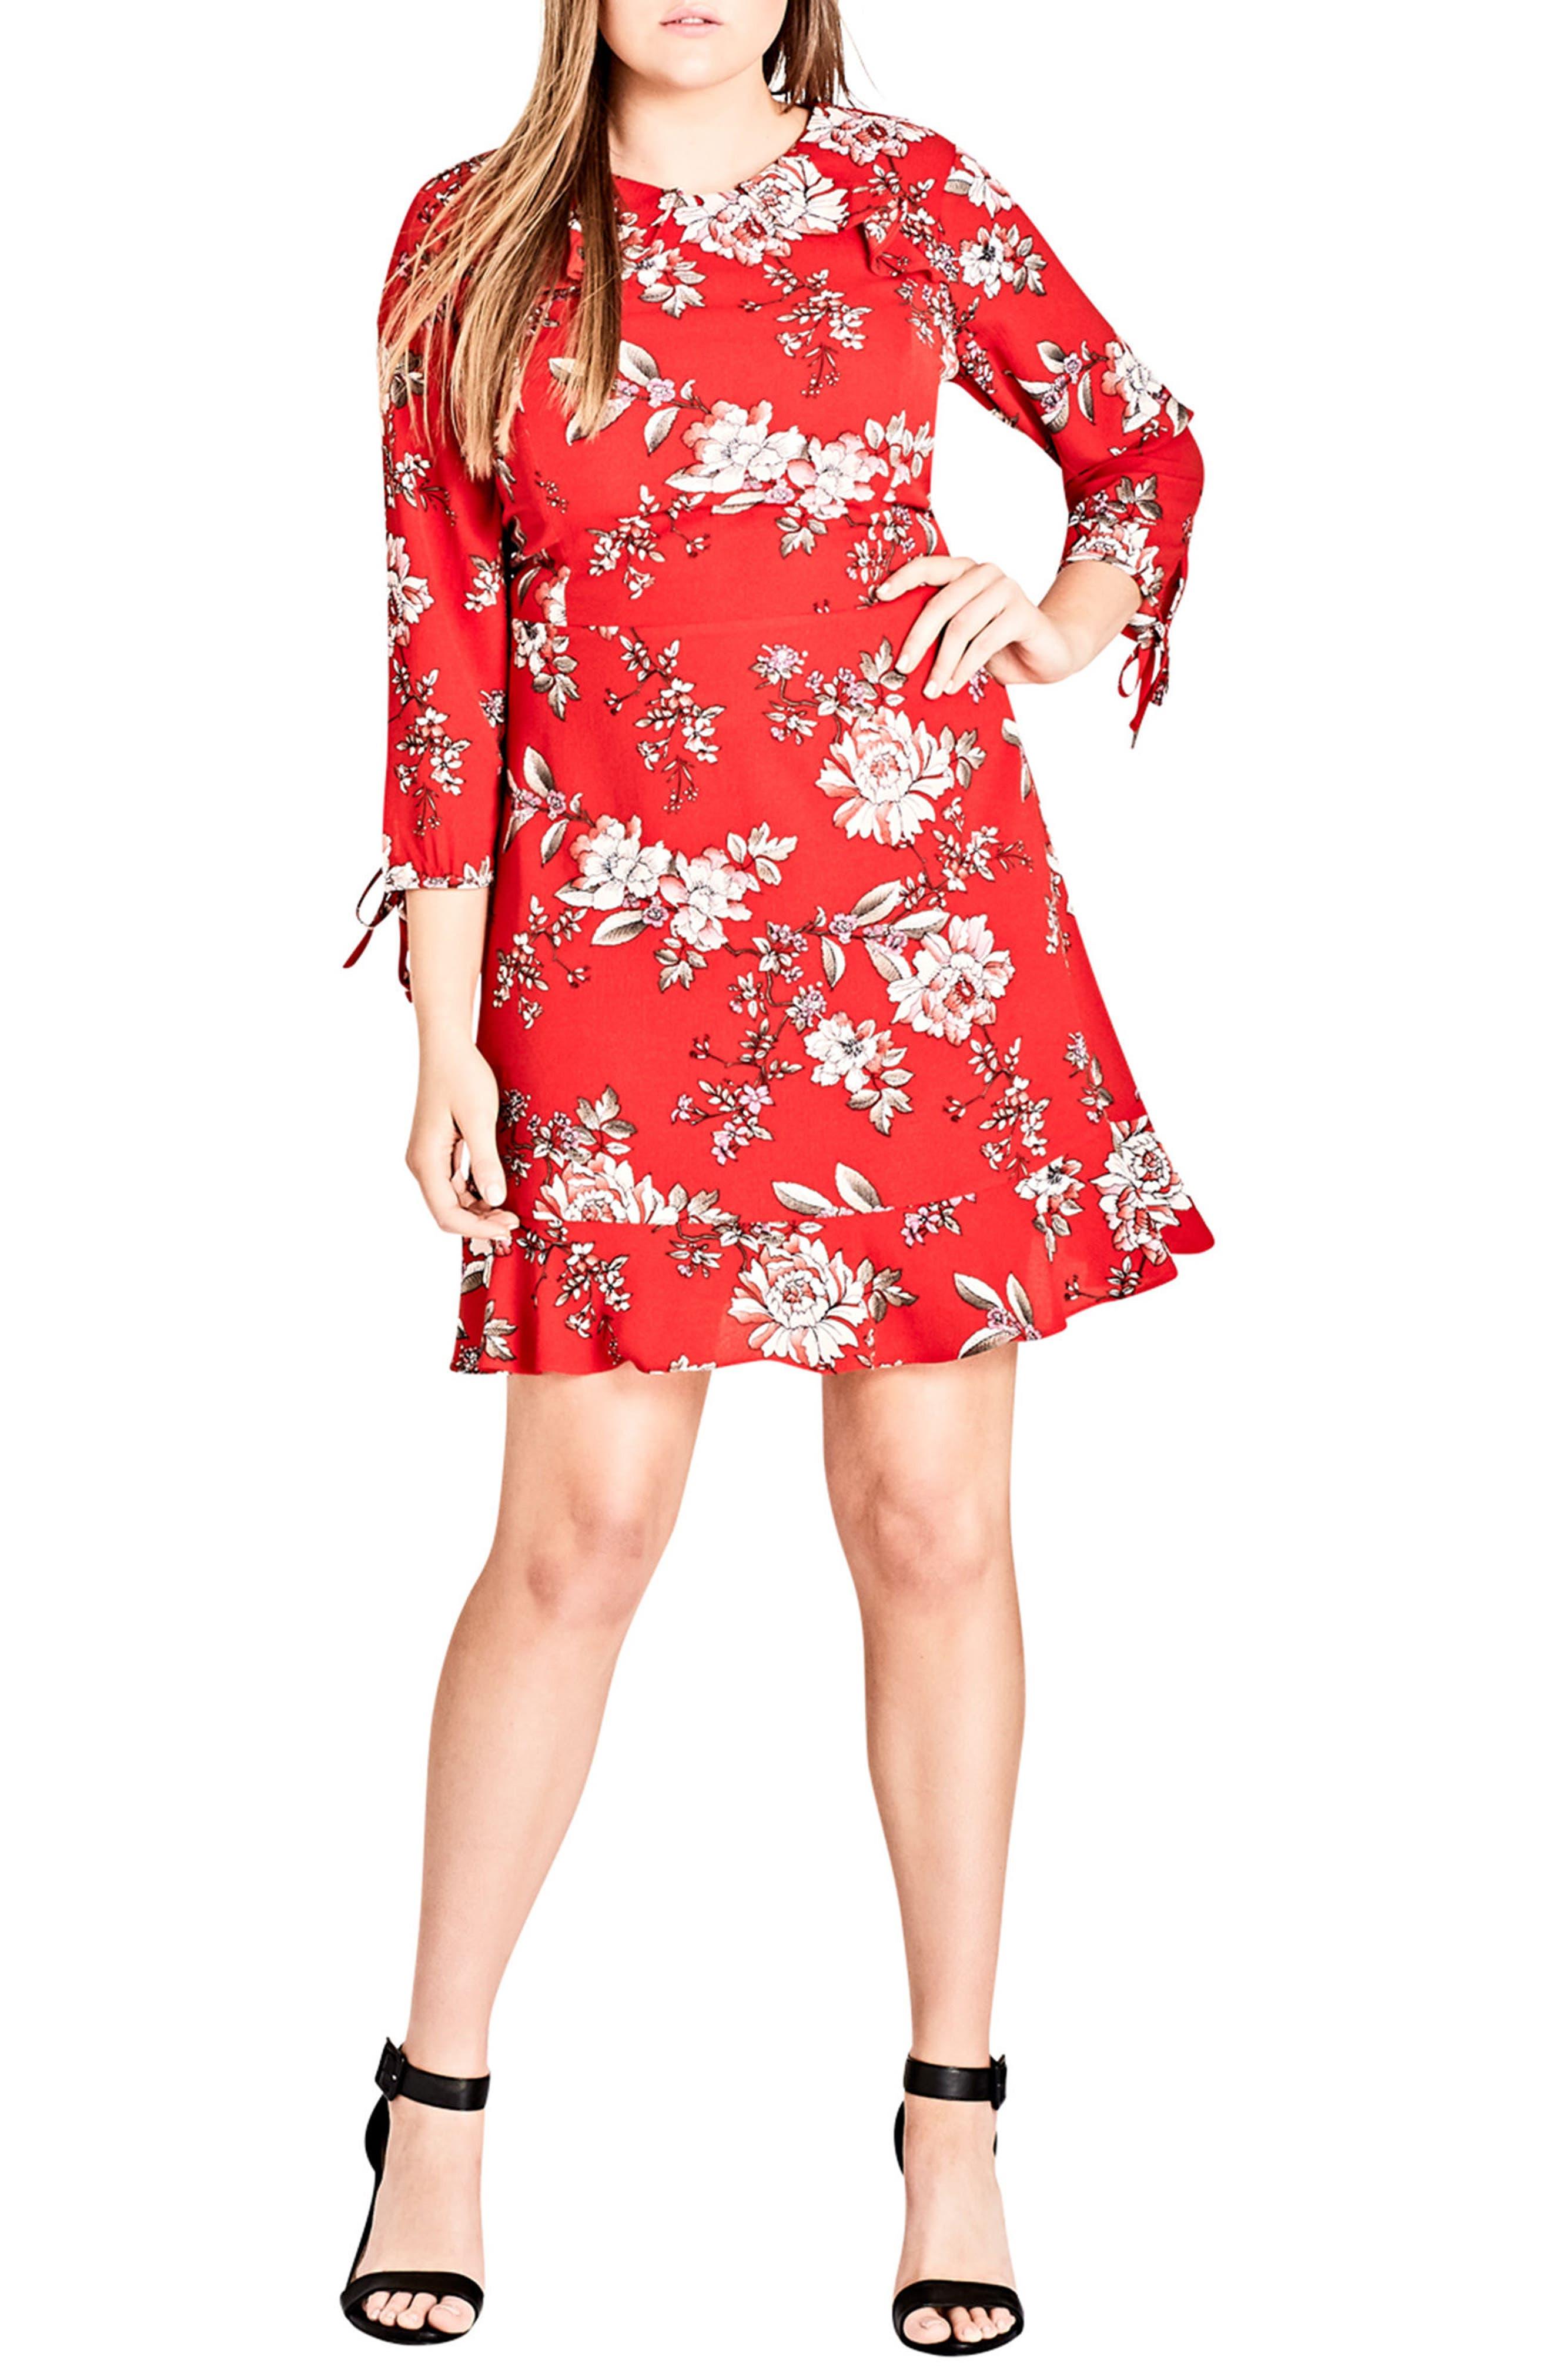 Main Image - City Chic Scarlet Floral Fit & Flare Dress (Plus Size)